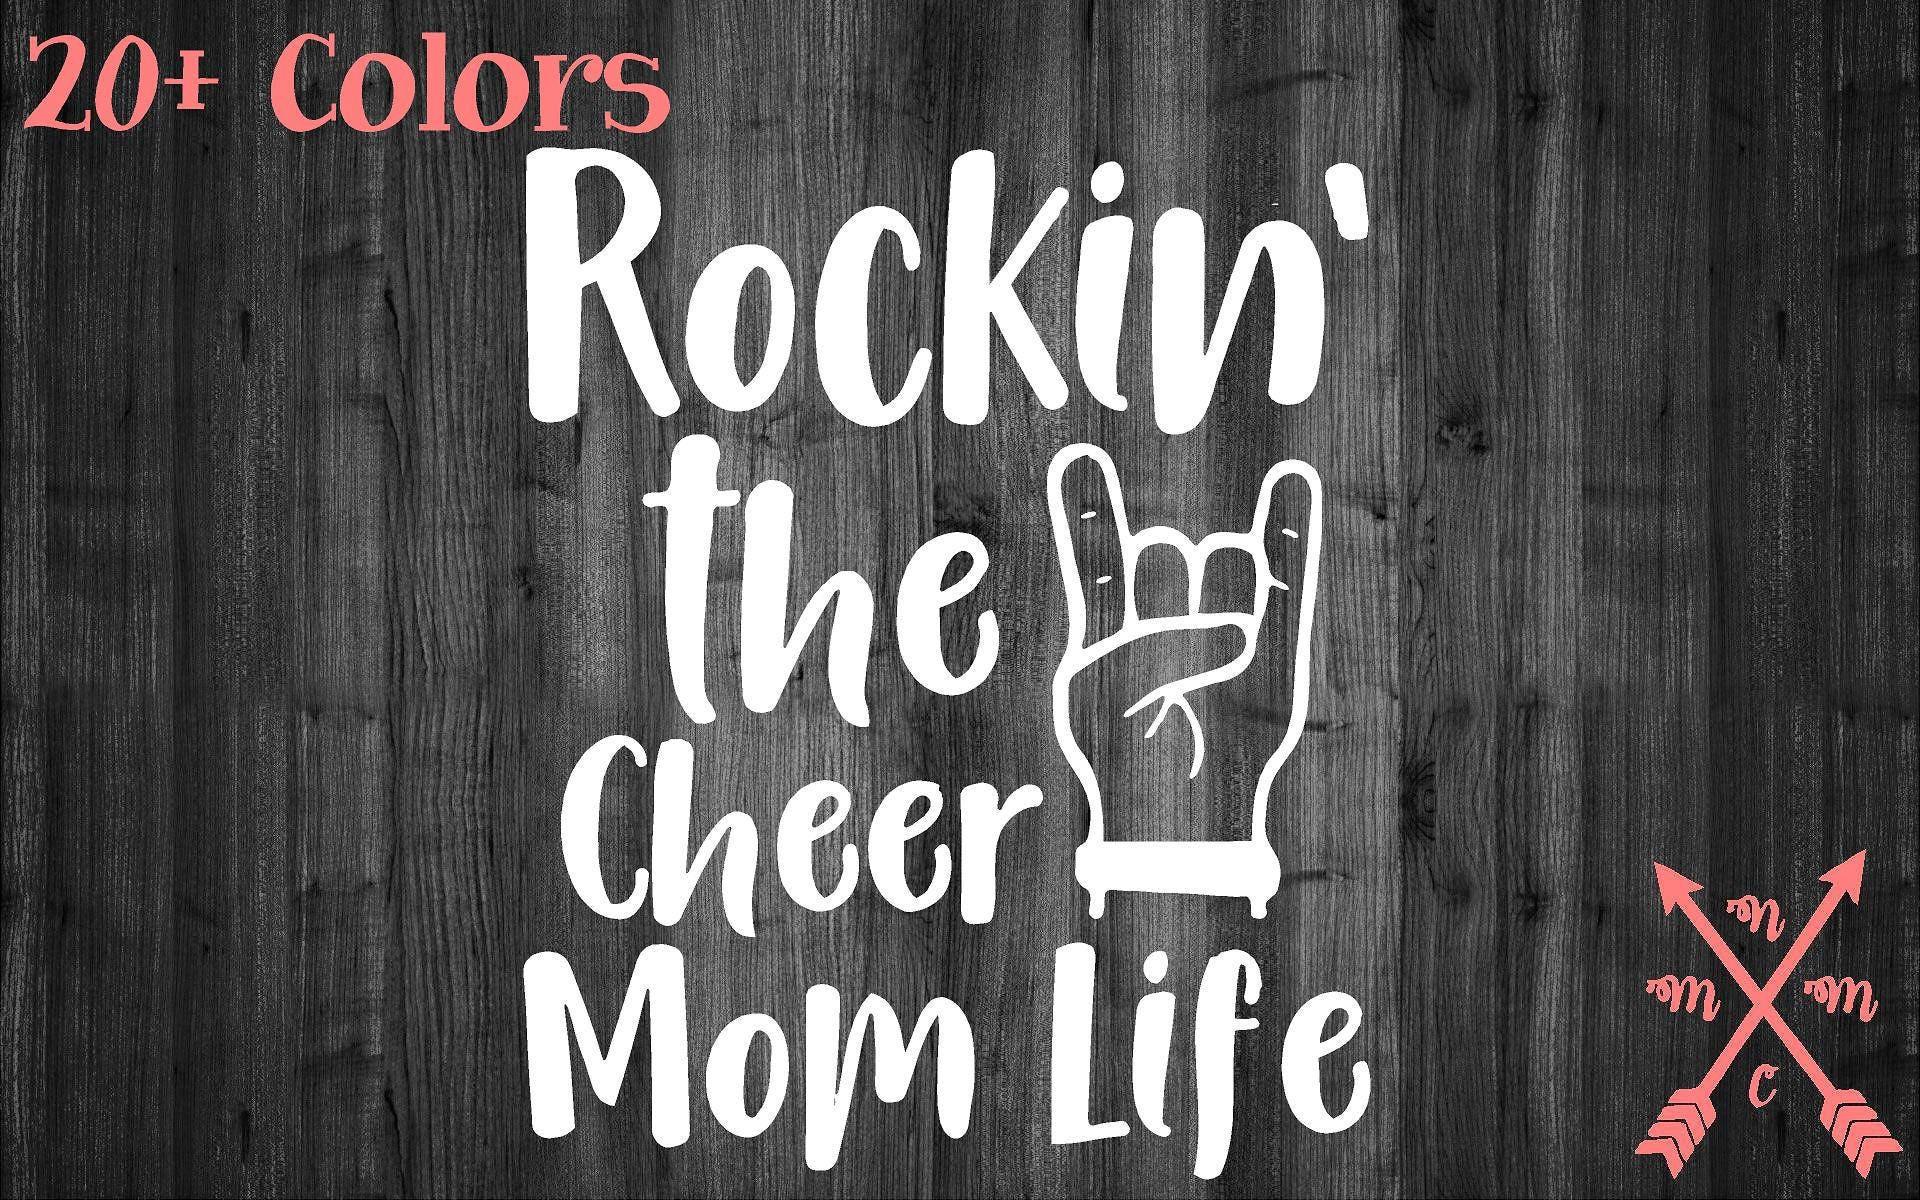 Rockin The Cheer Mom Life Vinyl Sticker Decal Sticker Car